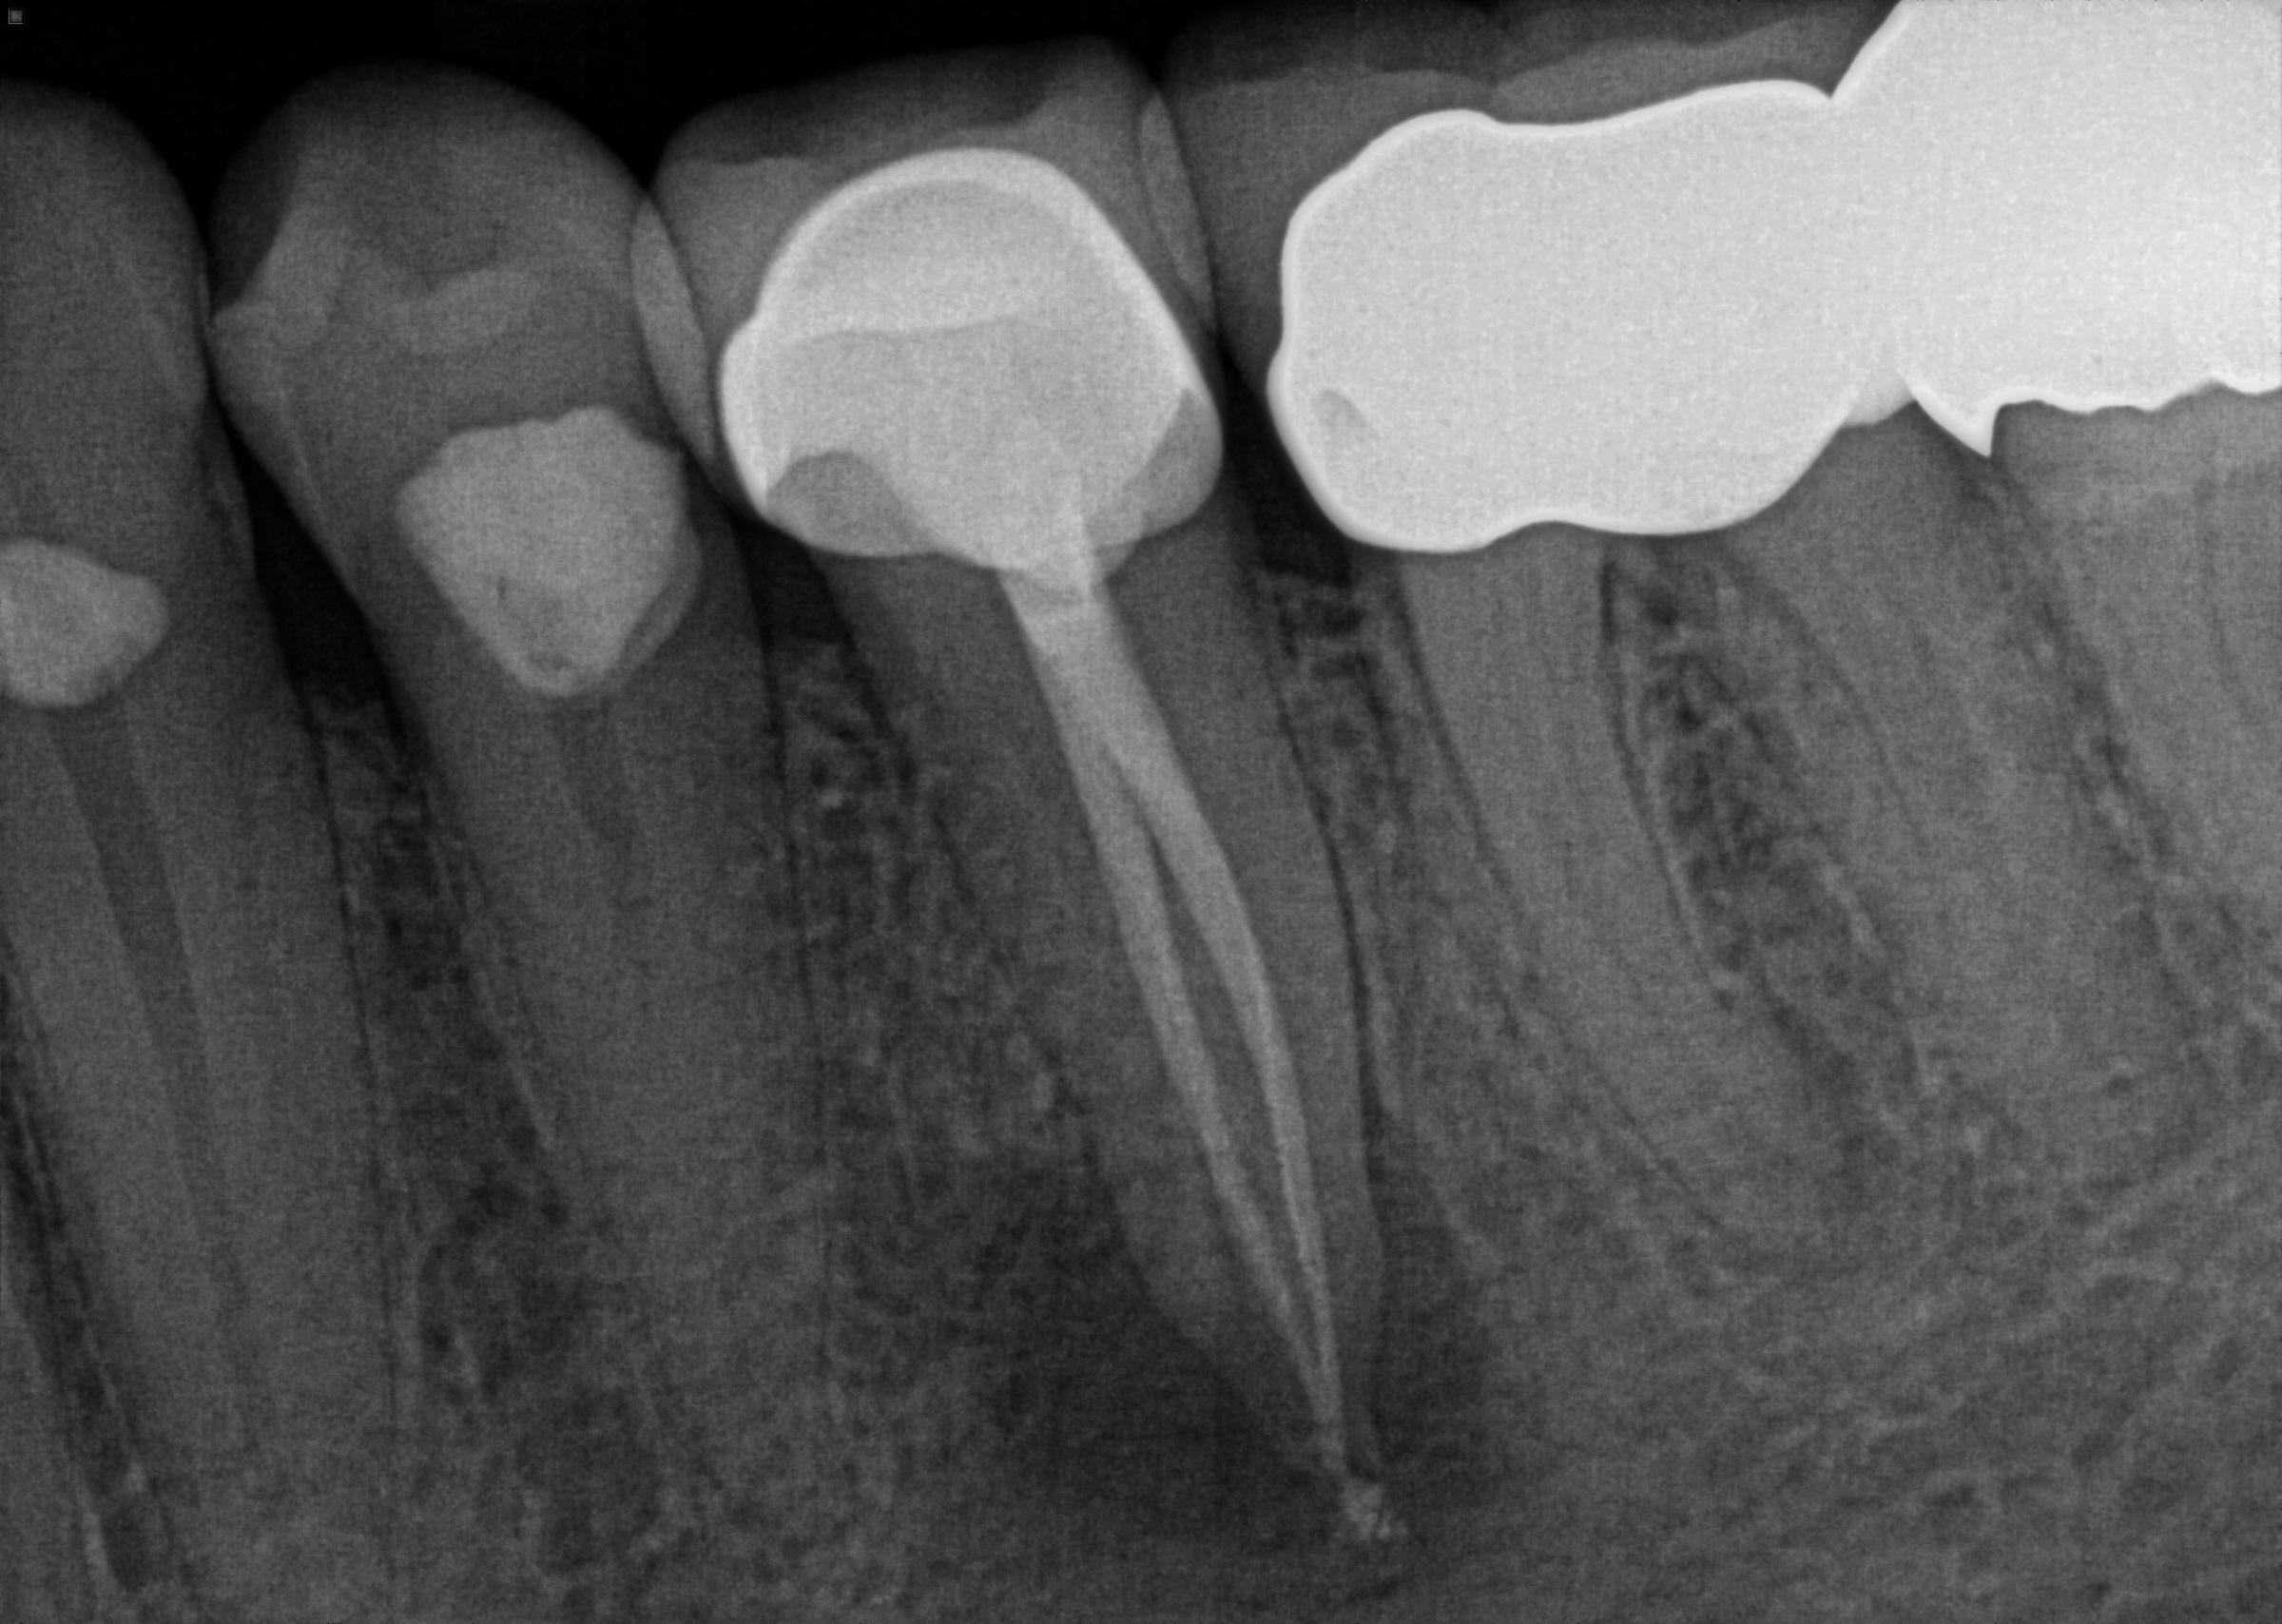 Final X-ray